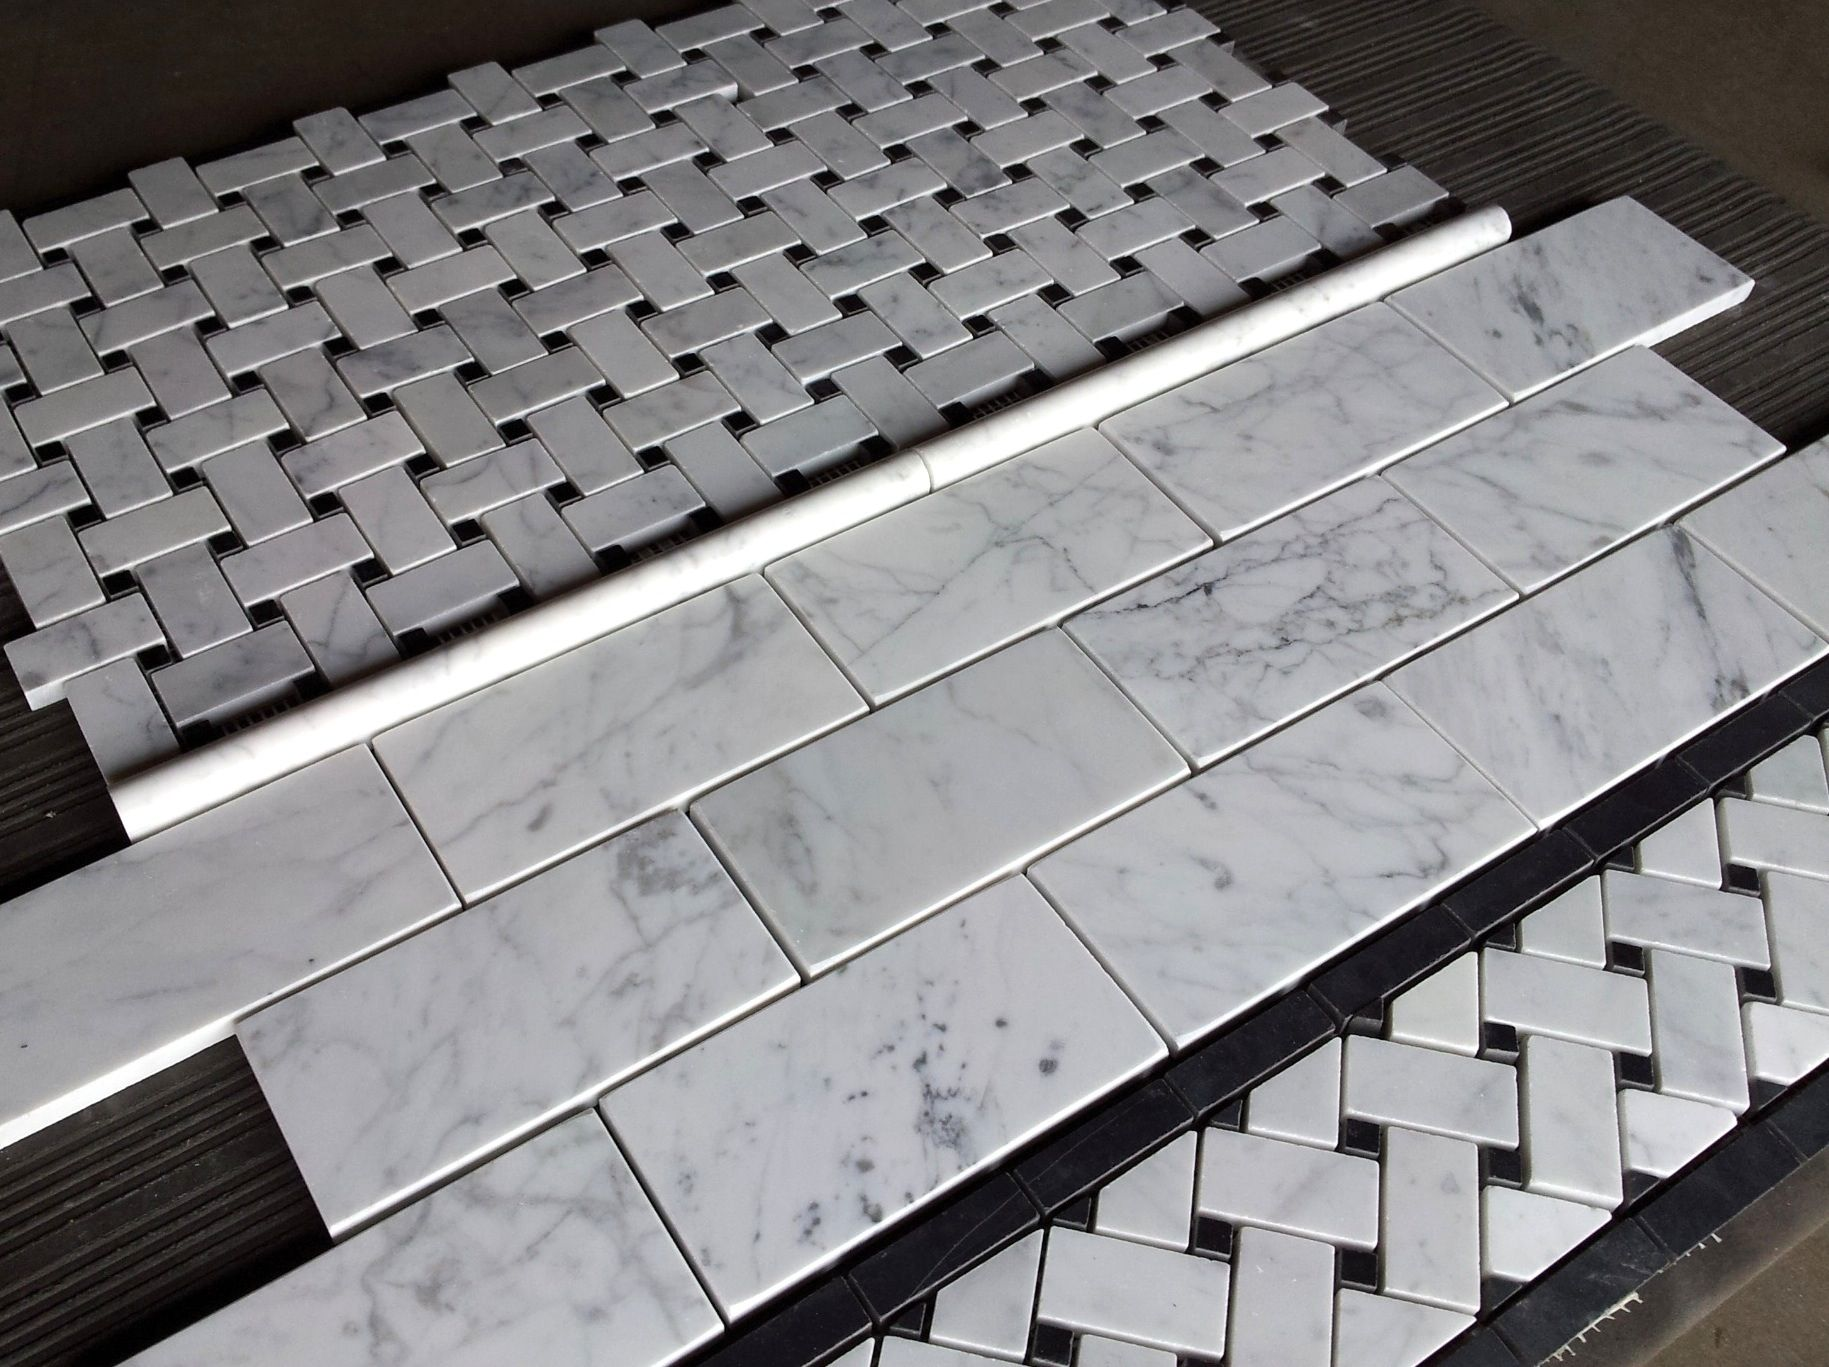 basket weave border tile floor - Google Search